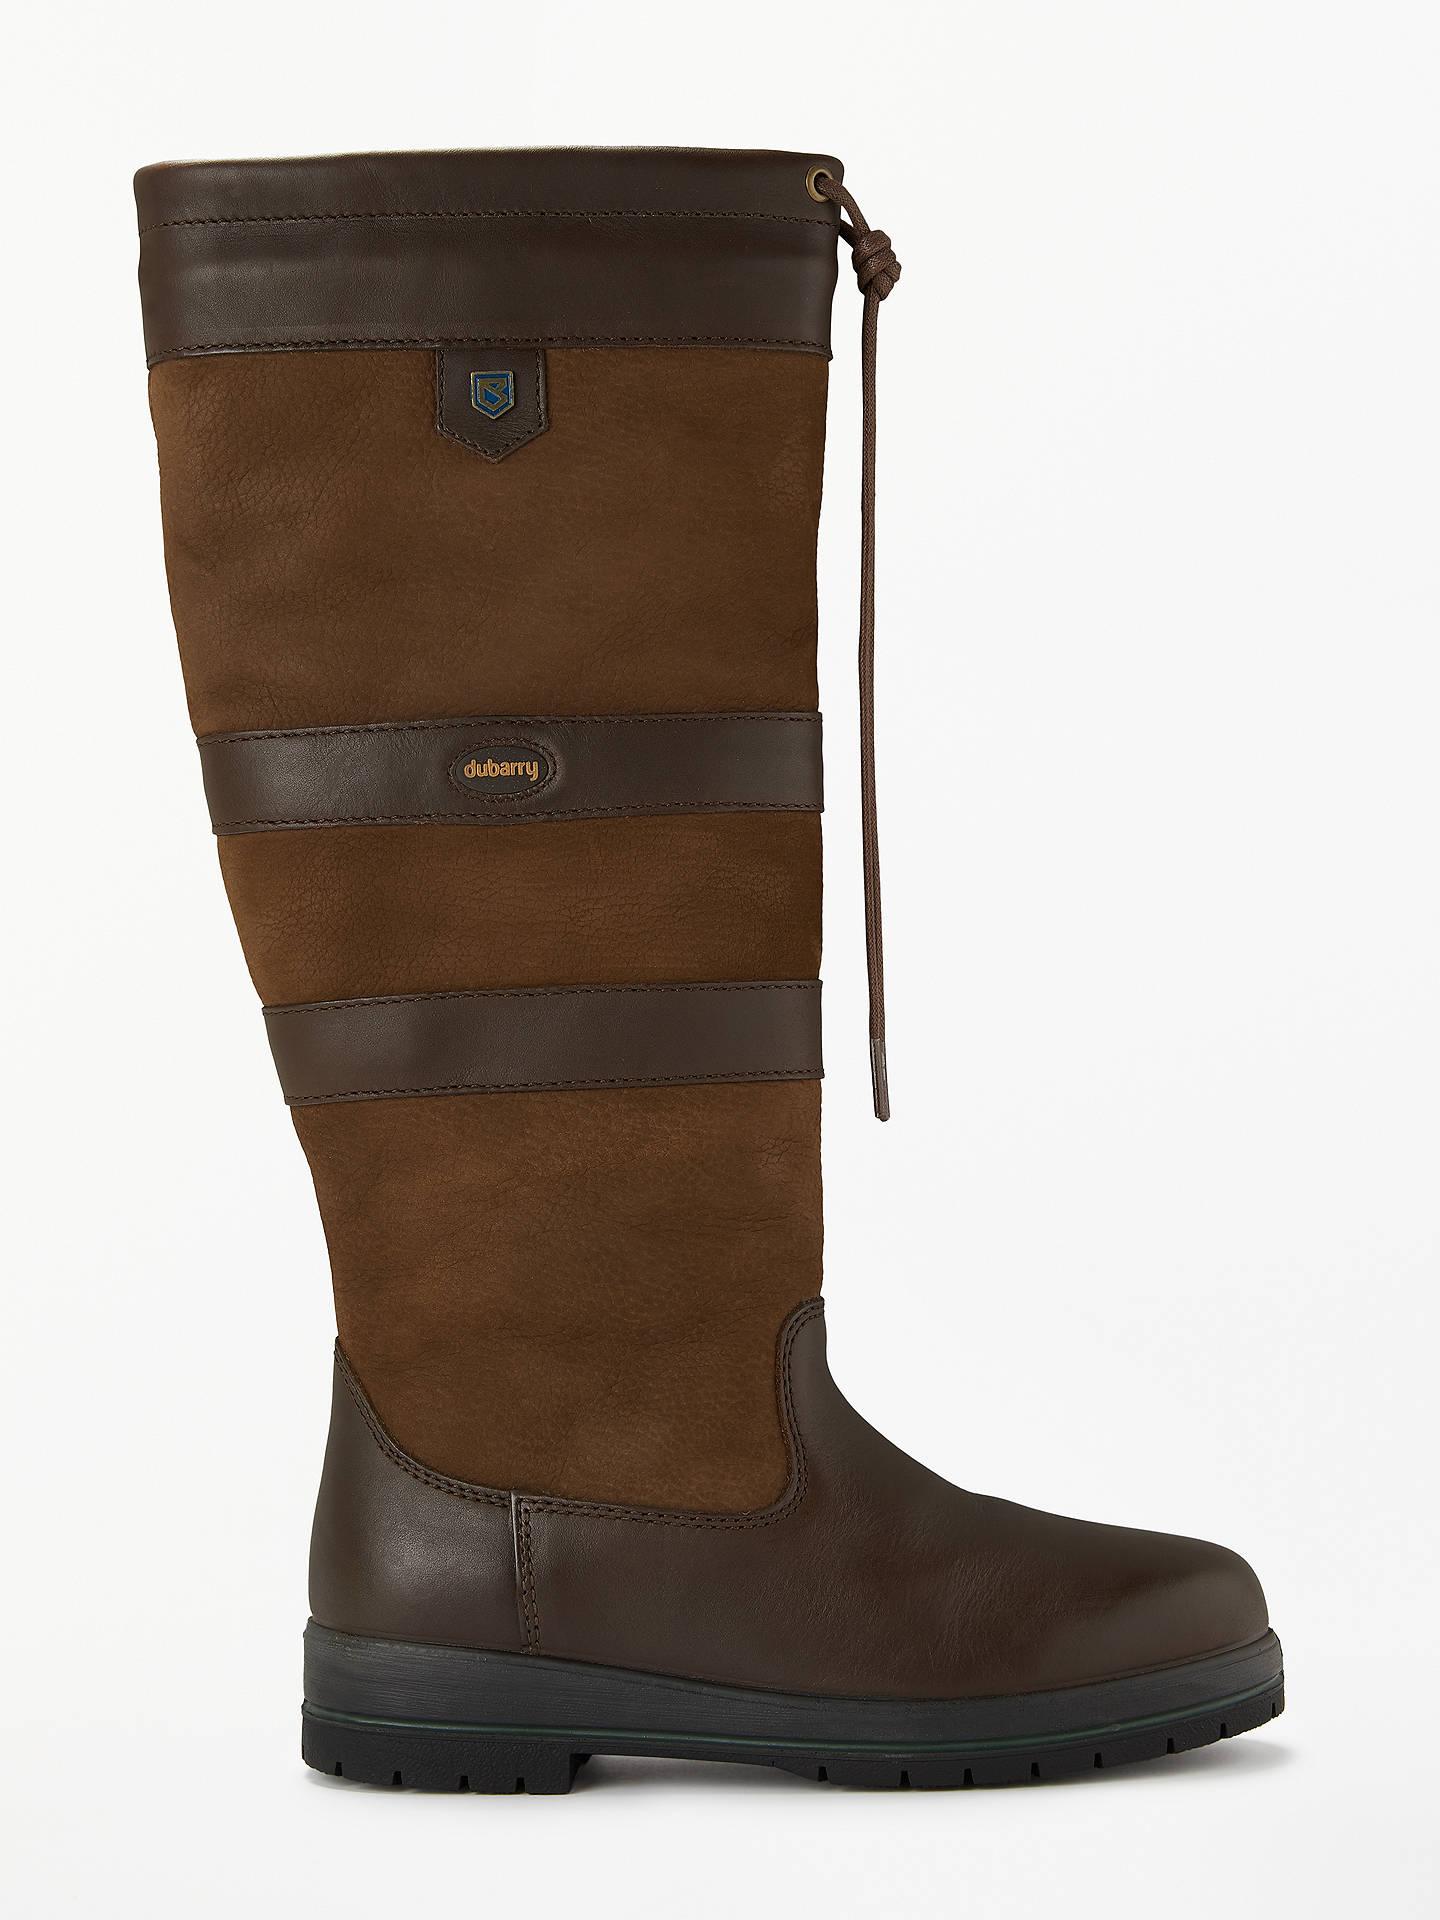 a1ab5aaa138 Buy Dubarry Galway Gortex Wide Calf Waterproof Knee High Boots